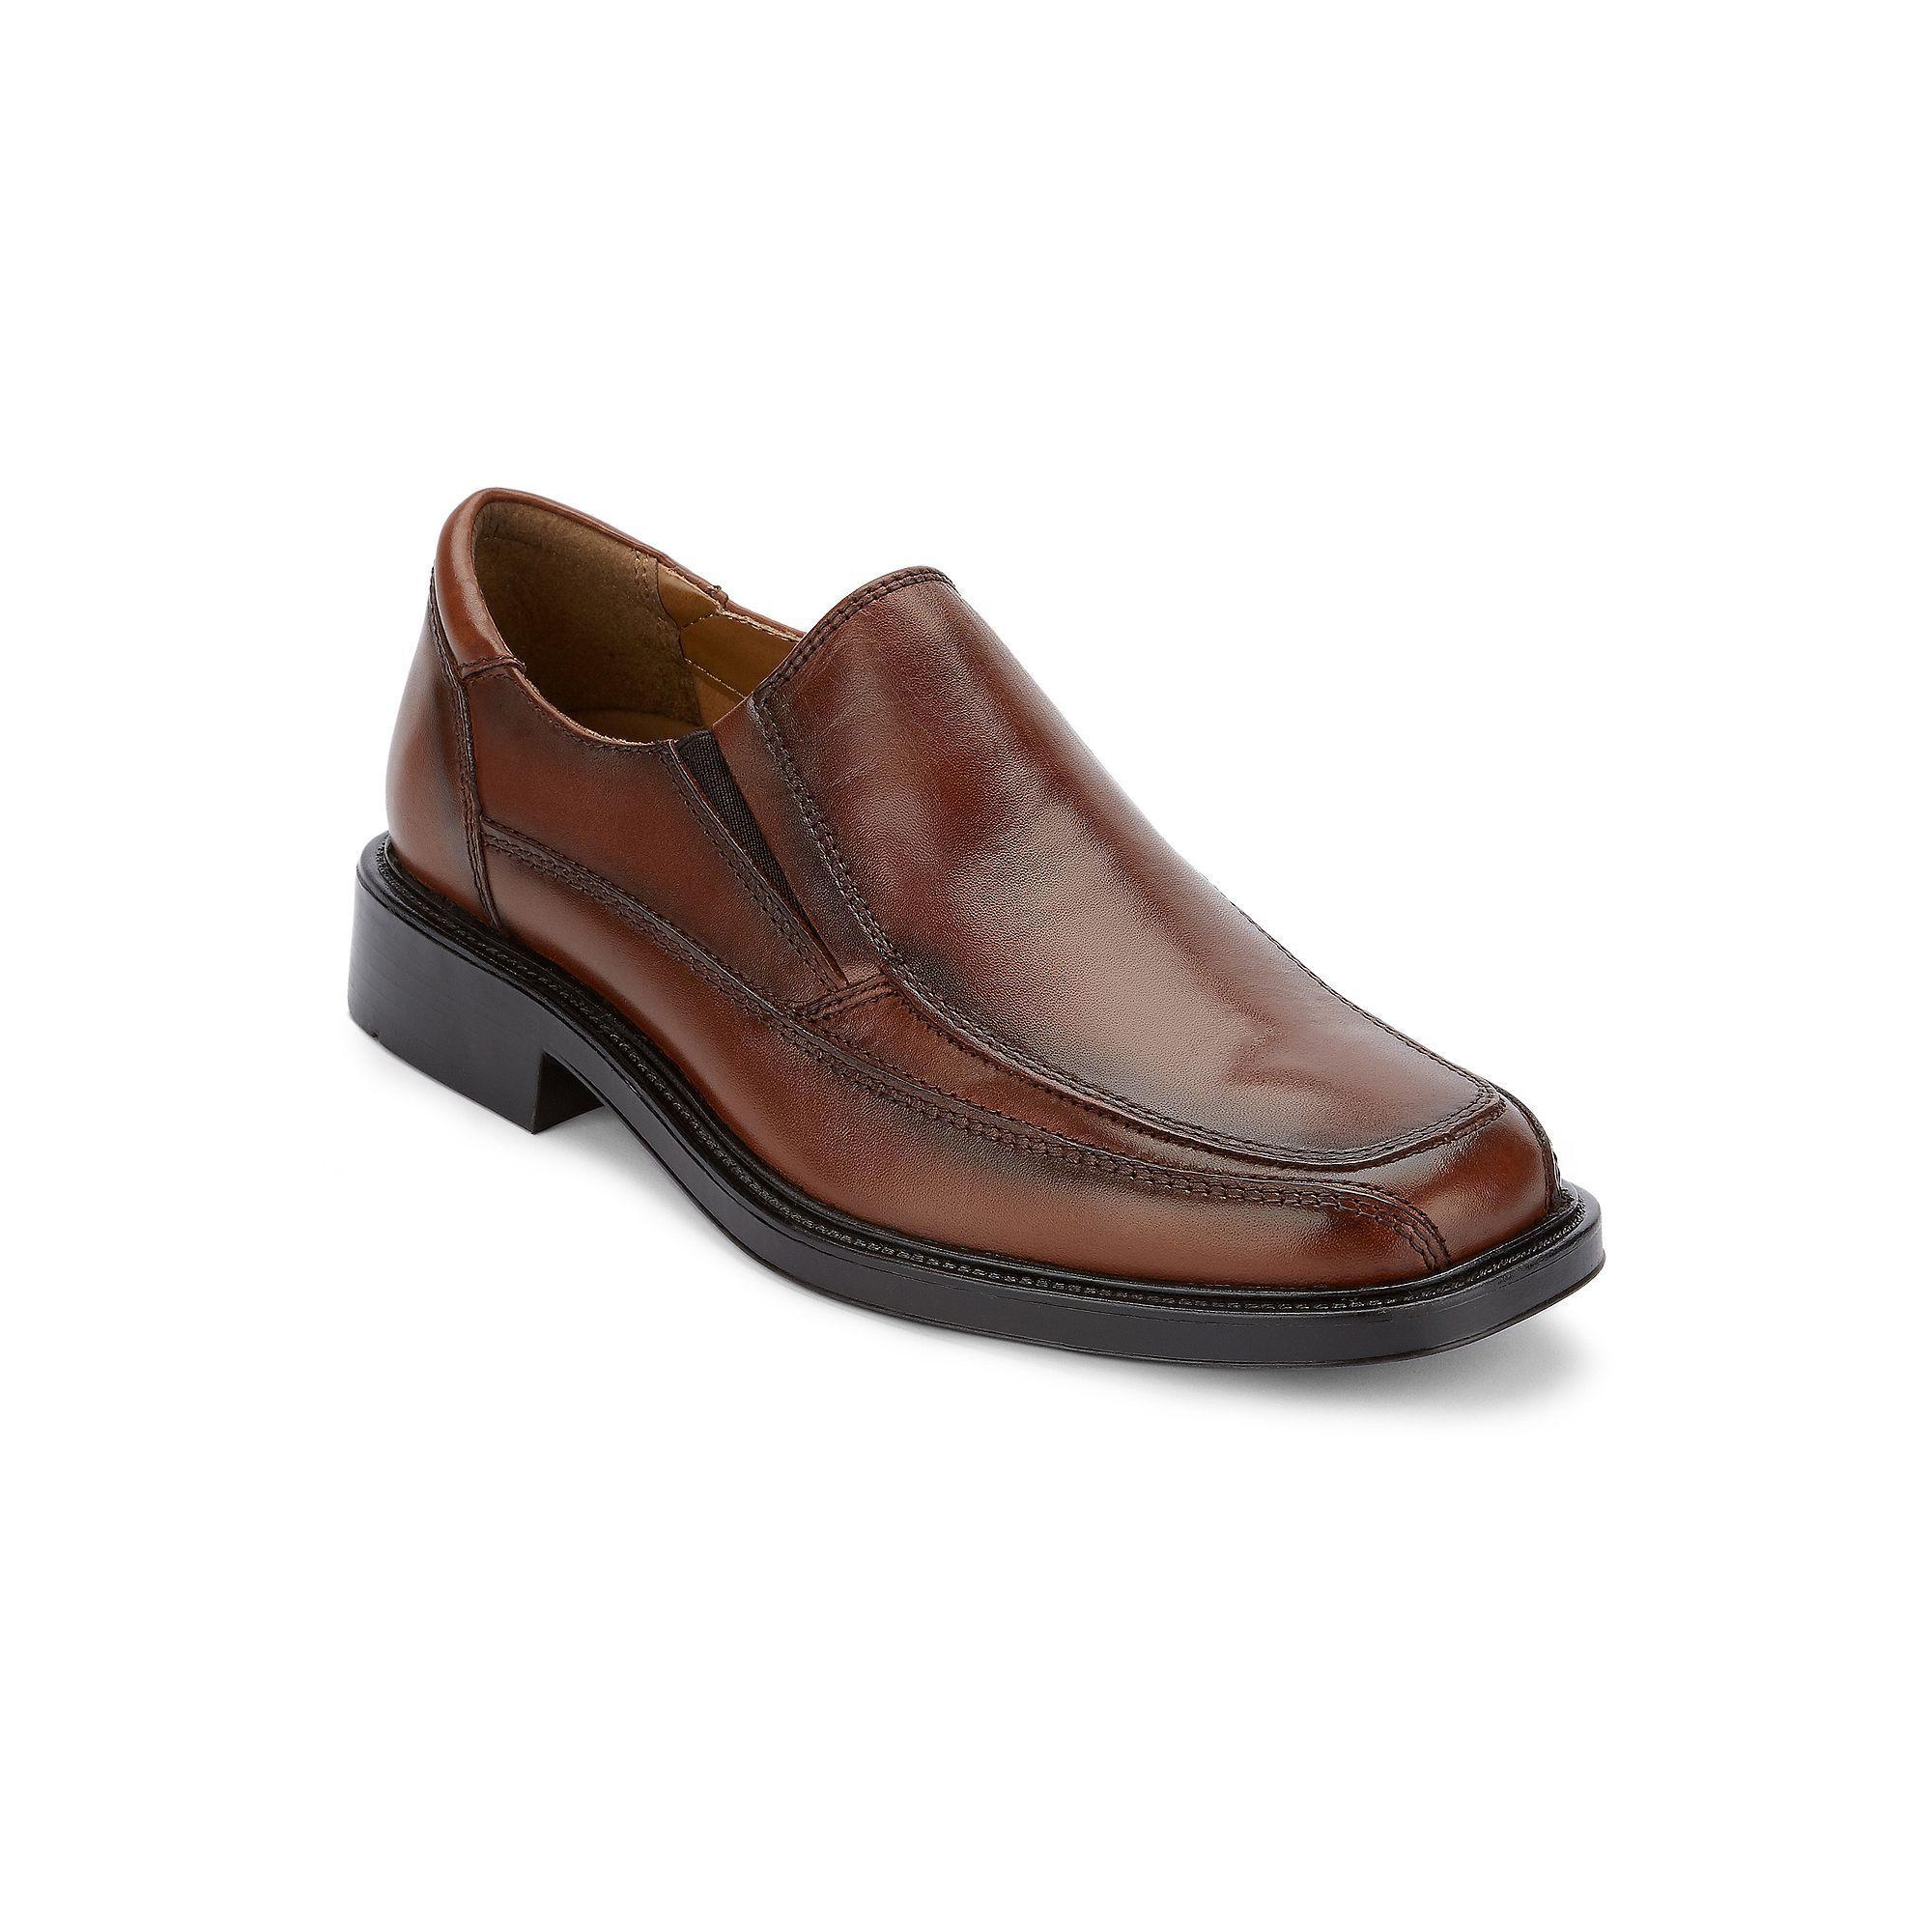 Men's Dockers Leather Casual Belt Vintage men, Uniqlo